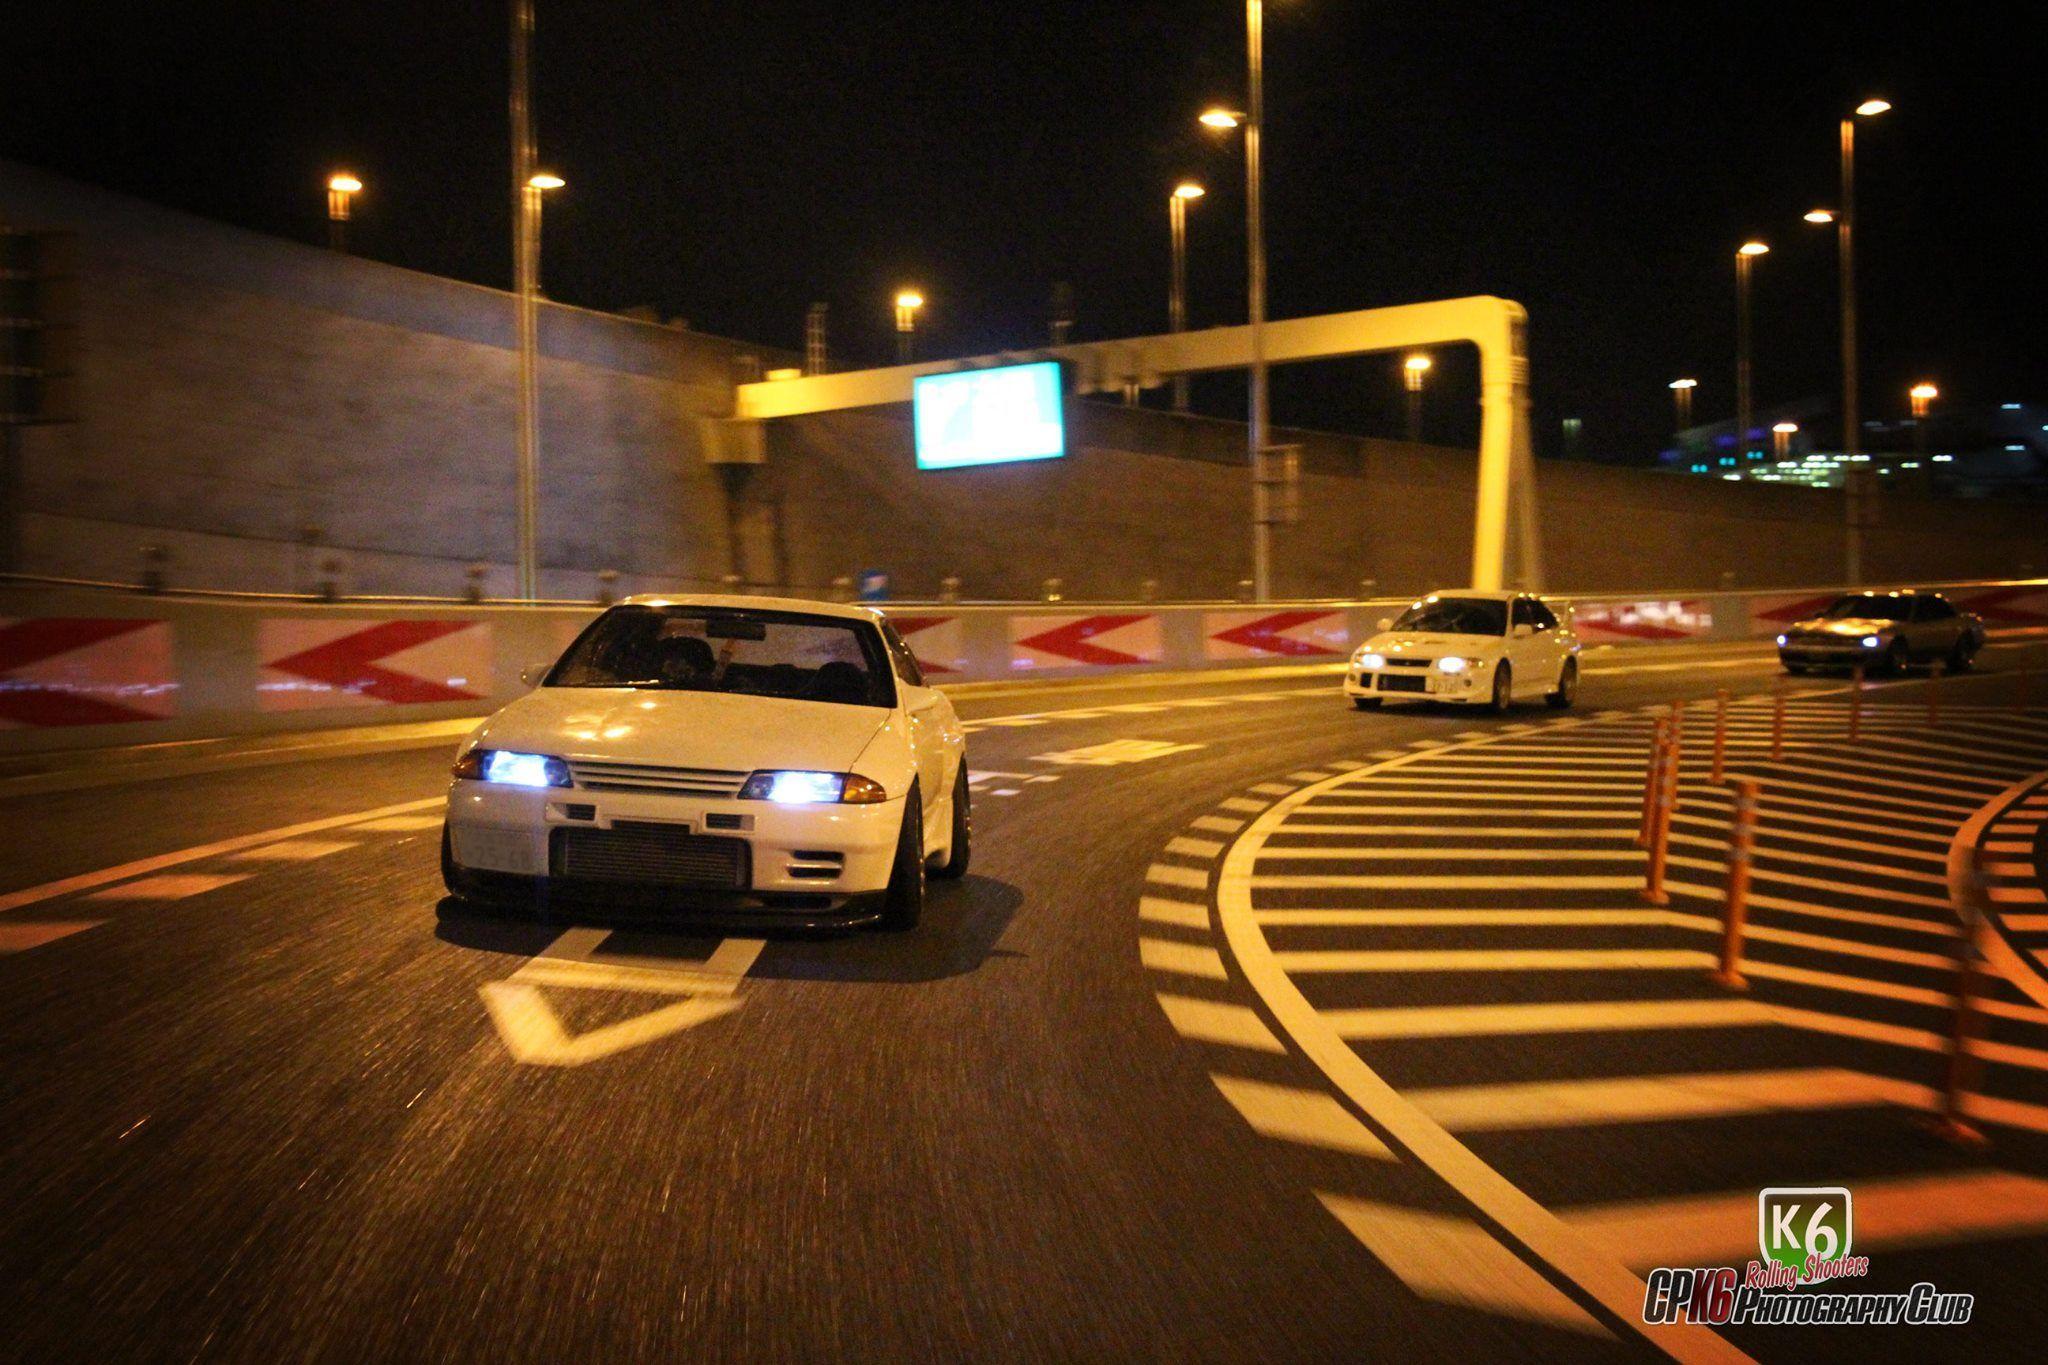 Japanese Racing Wallpapers Top Free Japanese Racing Backgrounds Wallpaperaccess